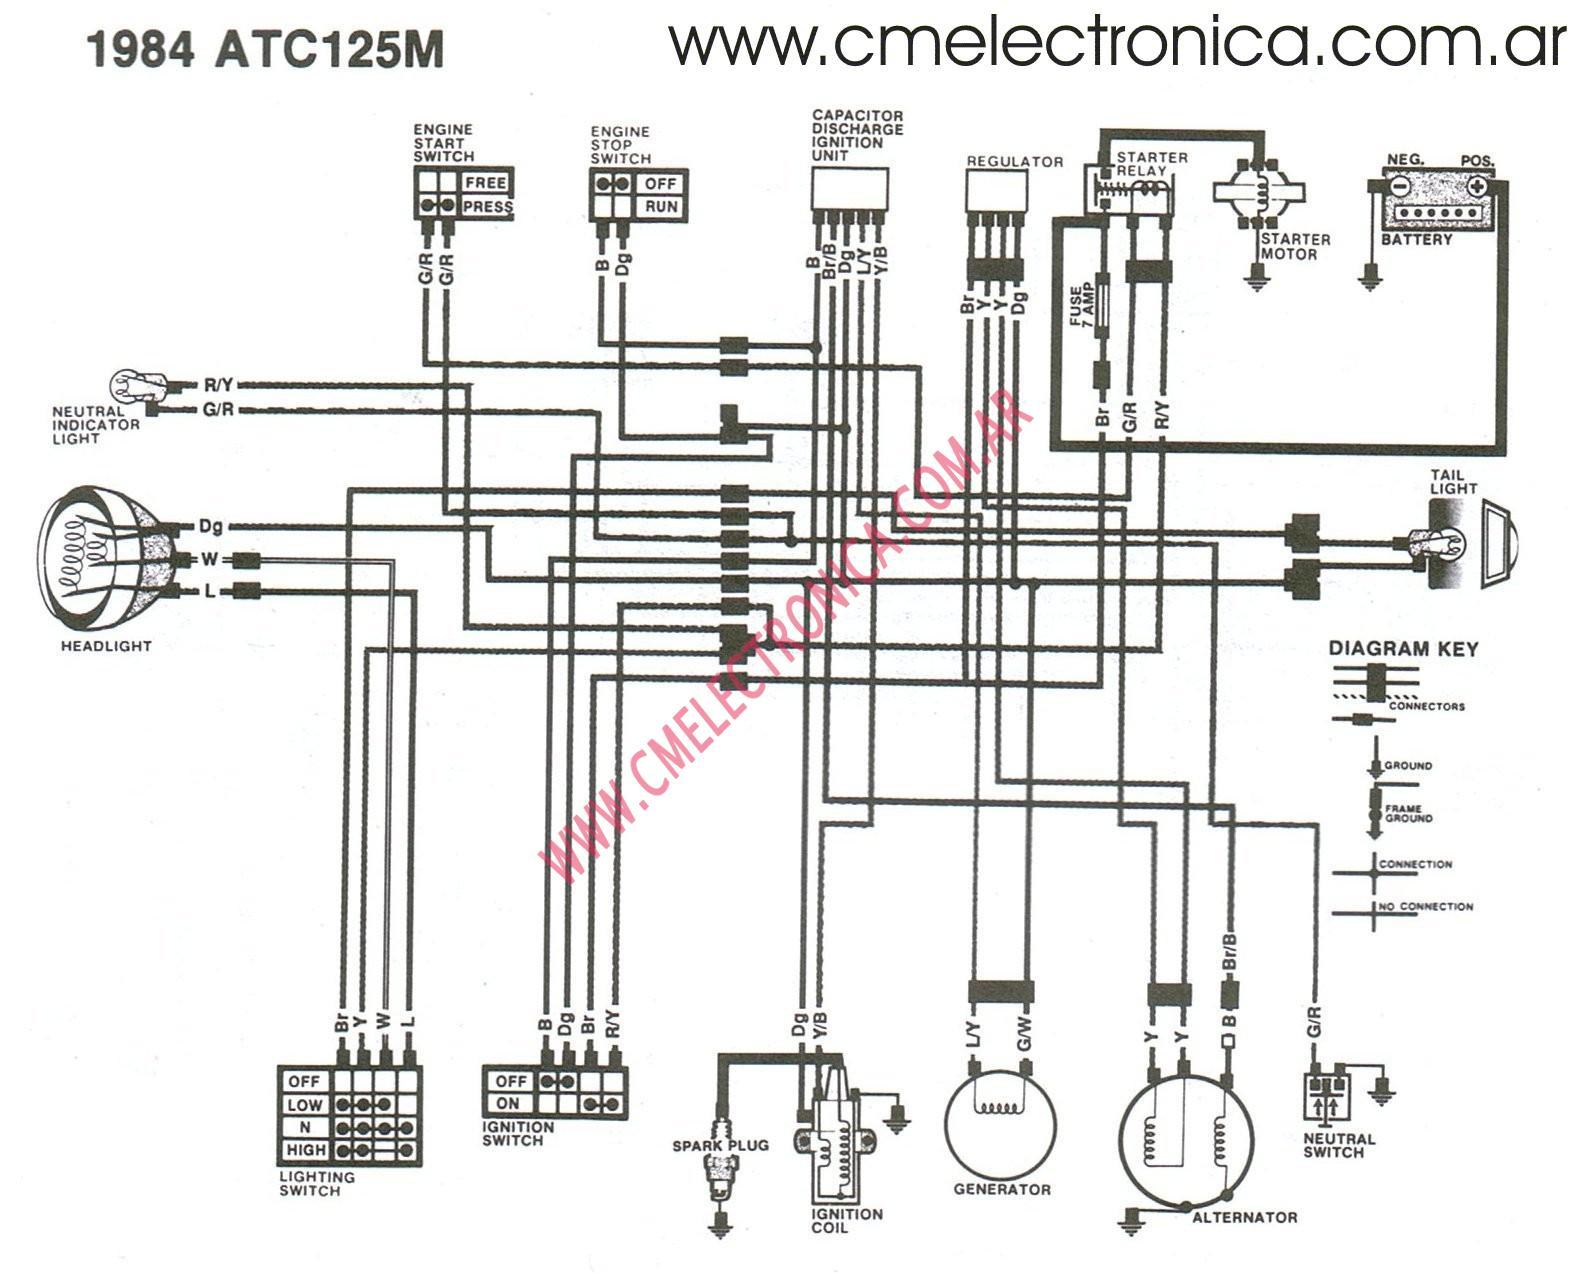 65 Hp Predator Engine Modifications   David SimchiLevi